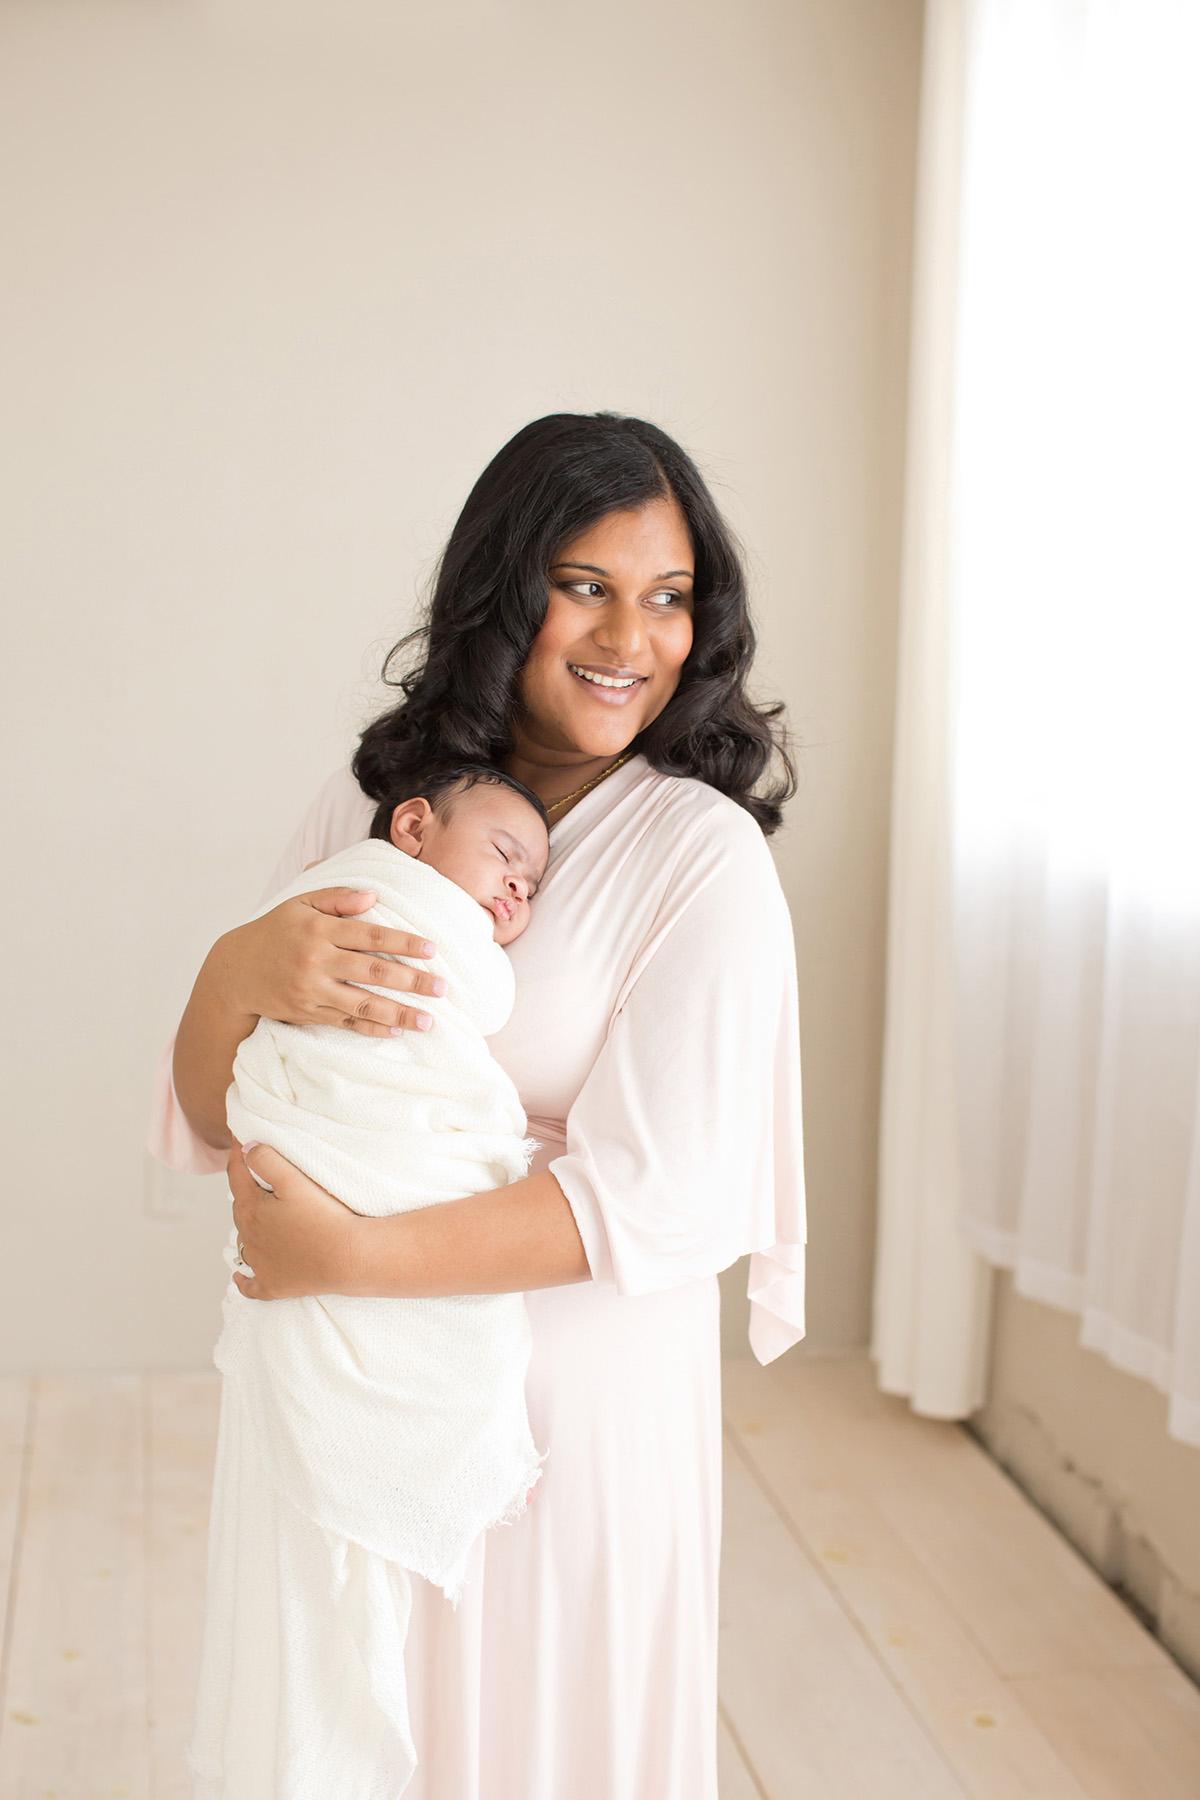 Newborn Maternity and Family Photographer in Louisville KY | Julie Brock Photography | Lexington KY Newborn Photographer | mother and baby photo shoot | boho newborn session.jpg